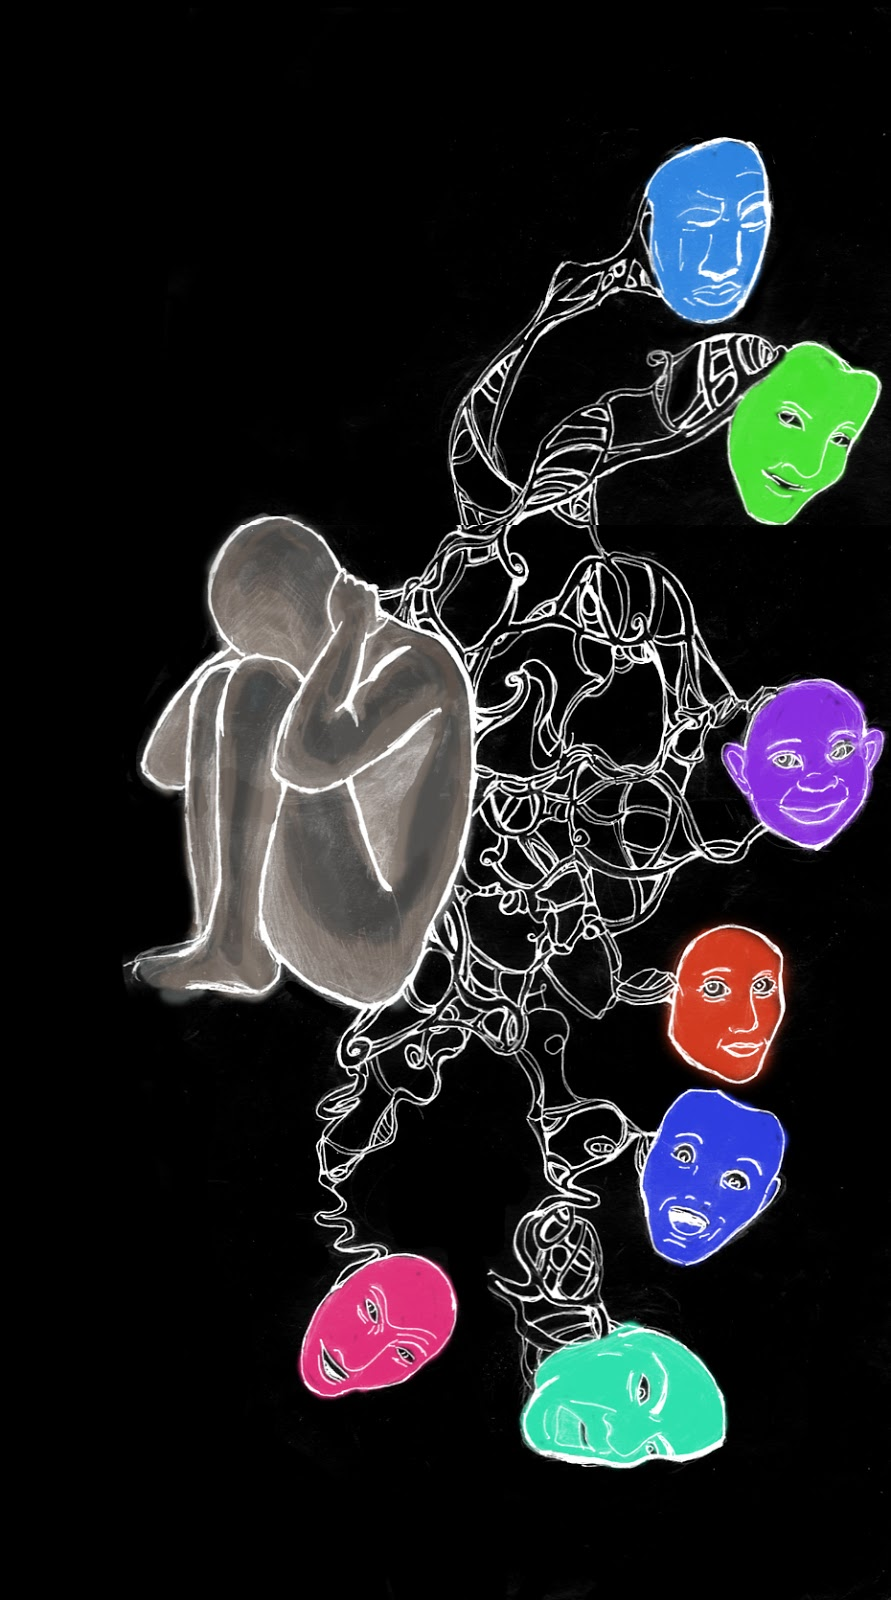 And Bipolar Disorder Art